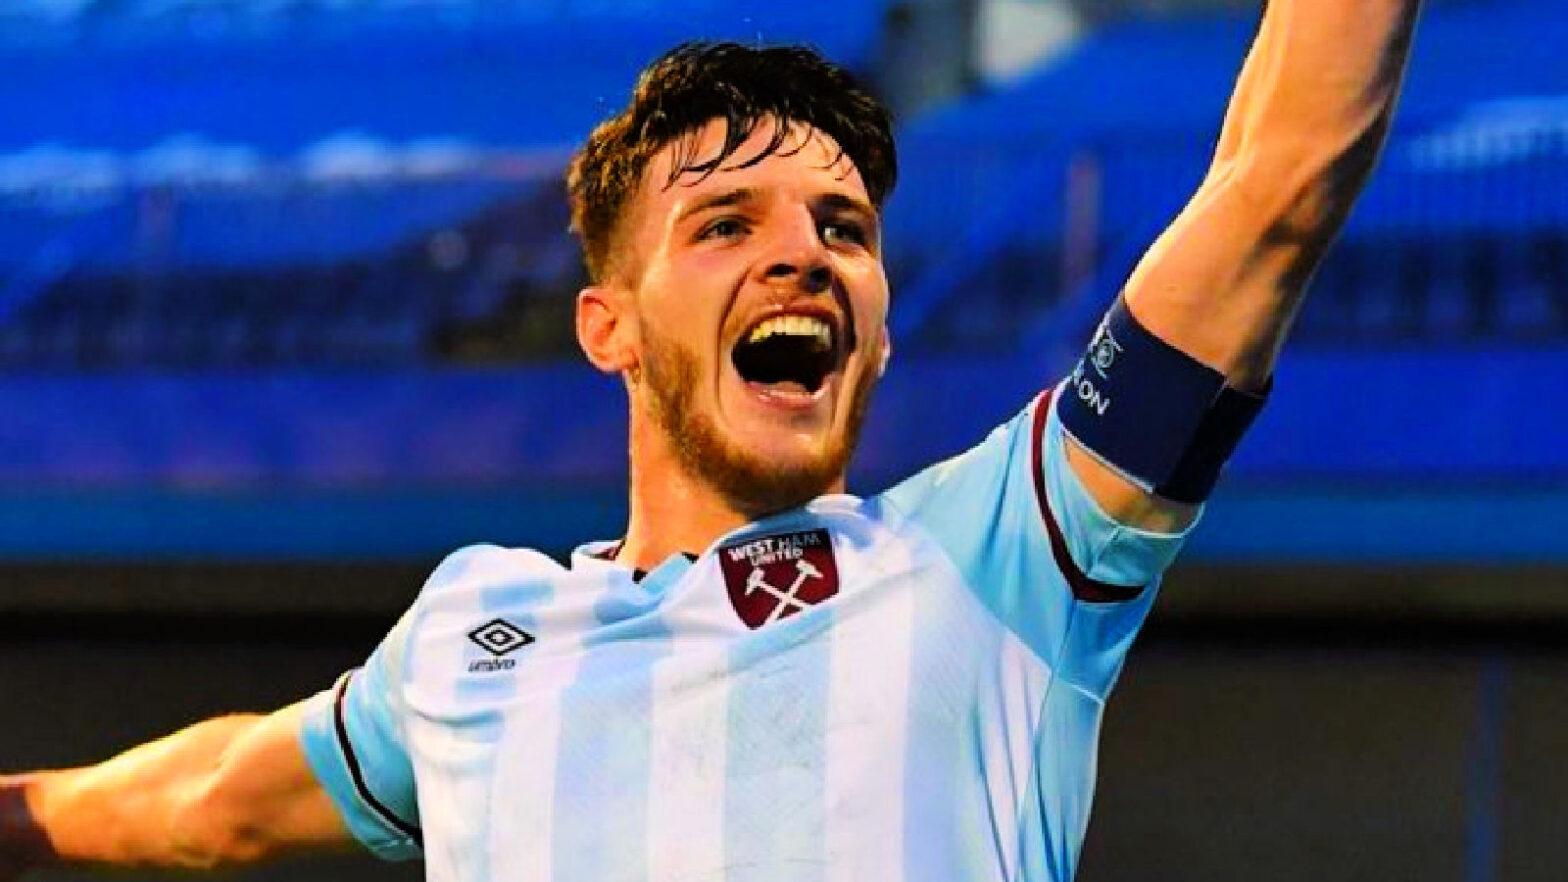 Declan Rice celebrates after scoring a goal against Dinamo Zagreb